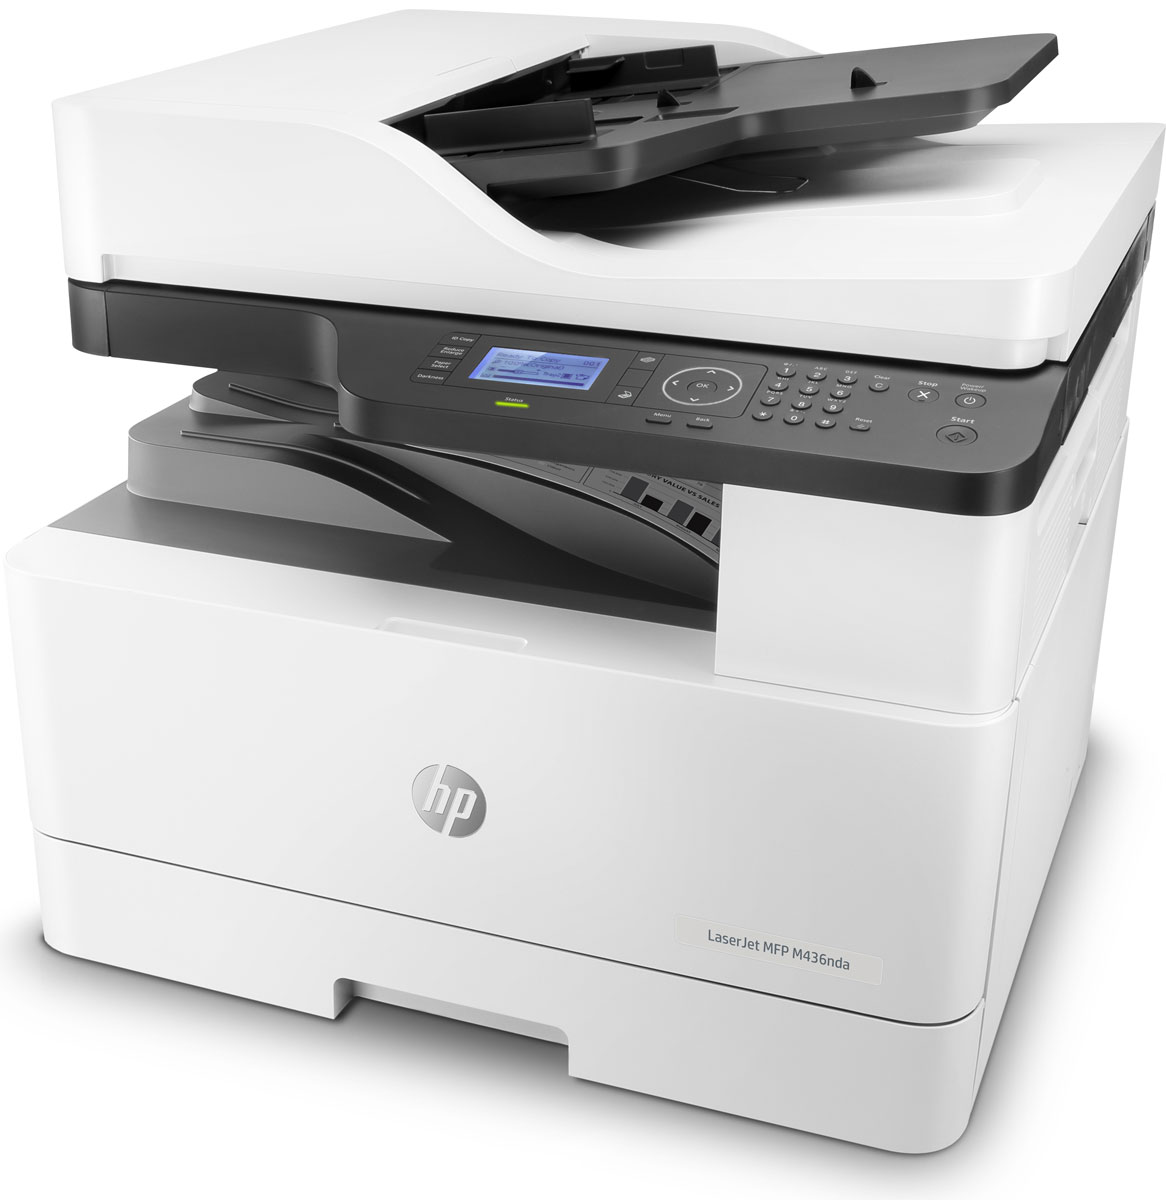 HP LaserJet M436nda МФУ принтер струйный epson l312